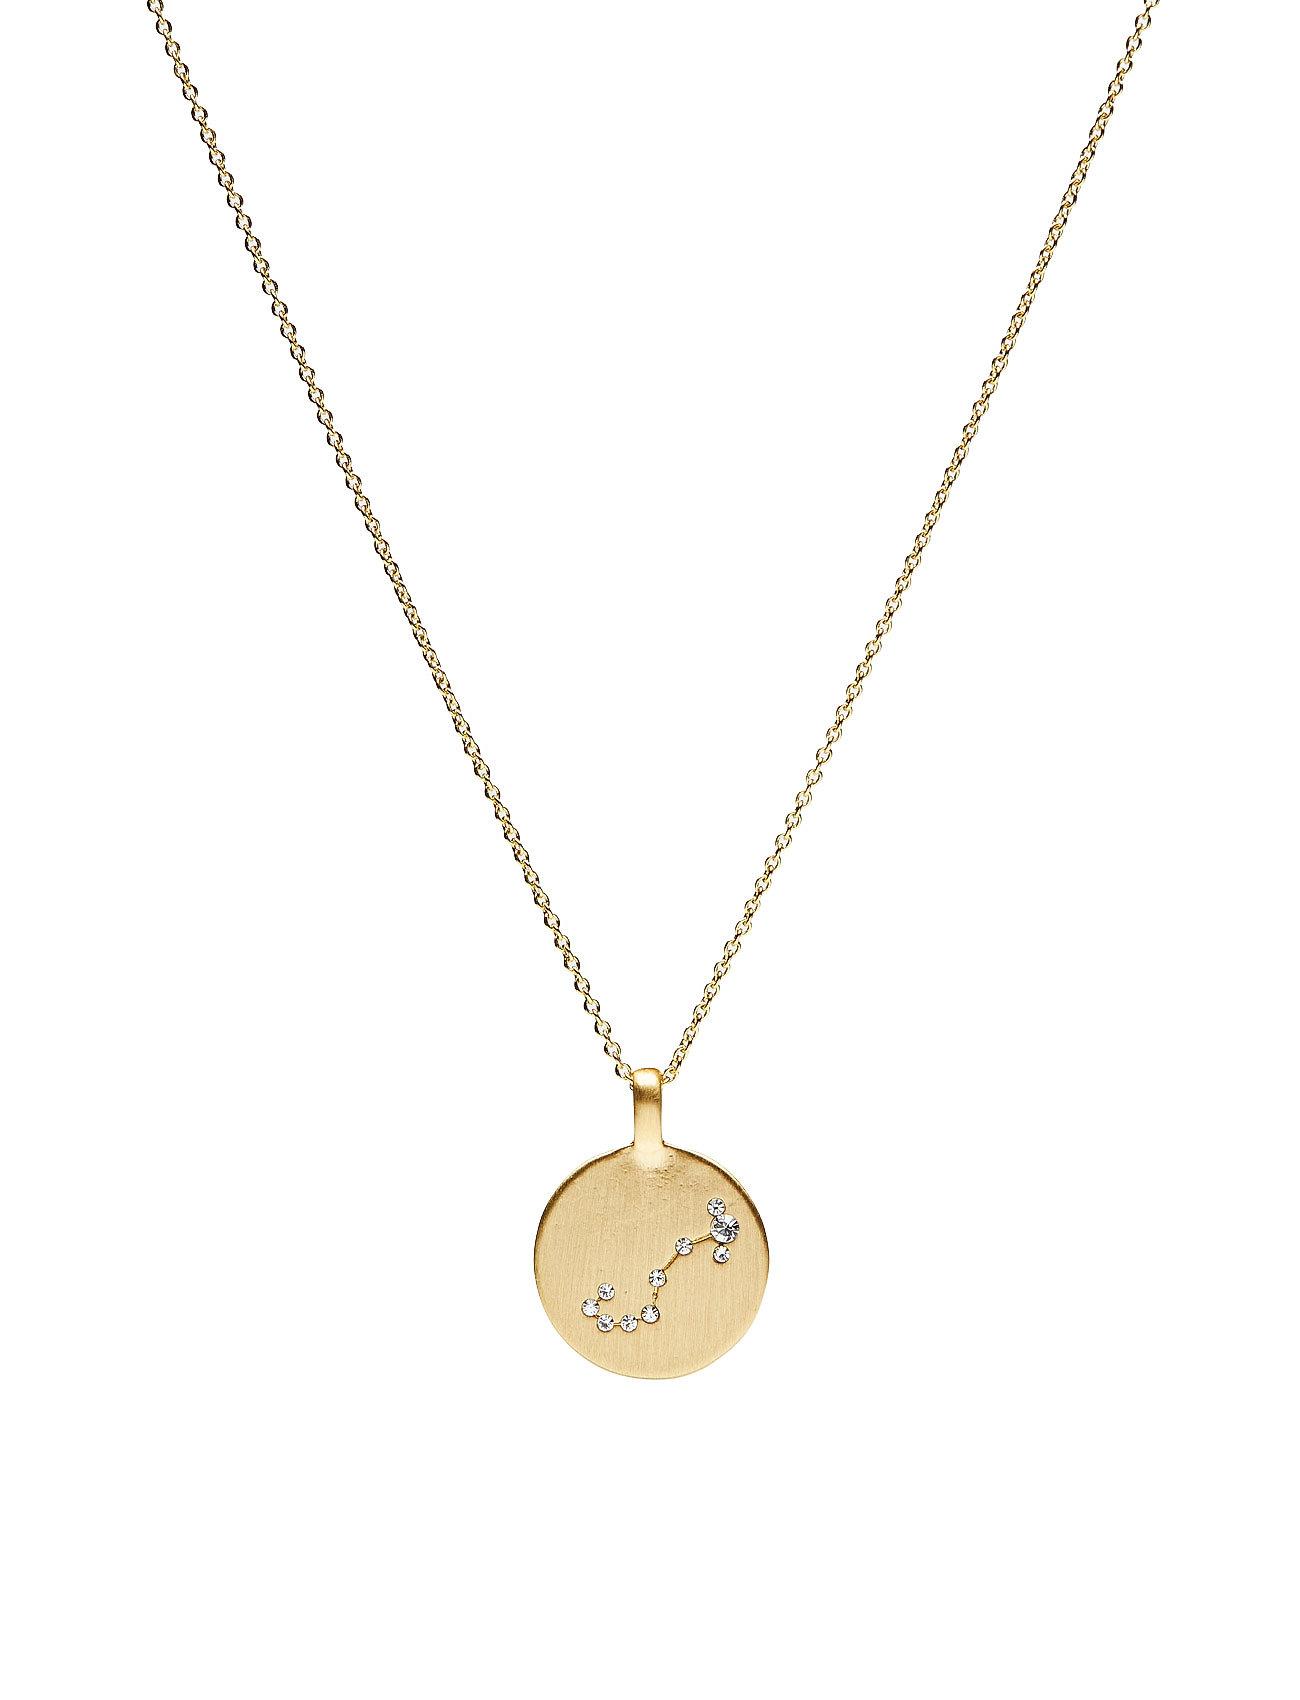 Pilgrim Scorpio 24/10 - 22/11 Accessories Jewellery Necklaces Dainty Necklaces Kulta Pilgrim